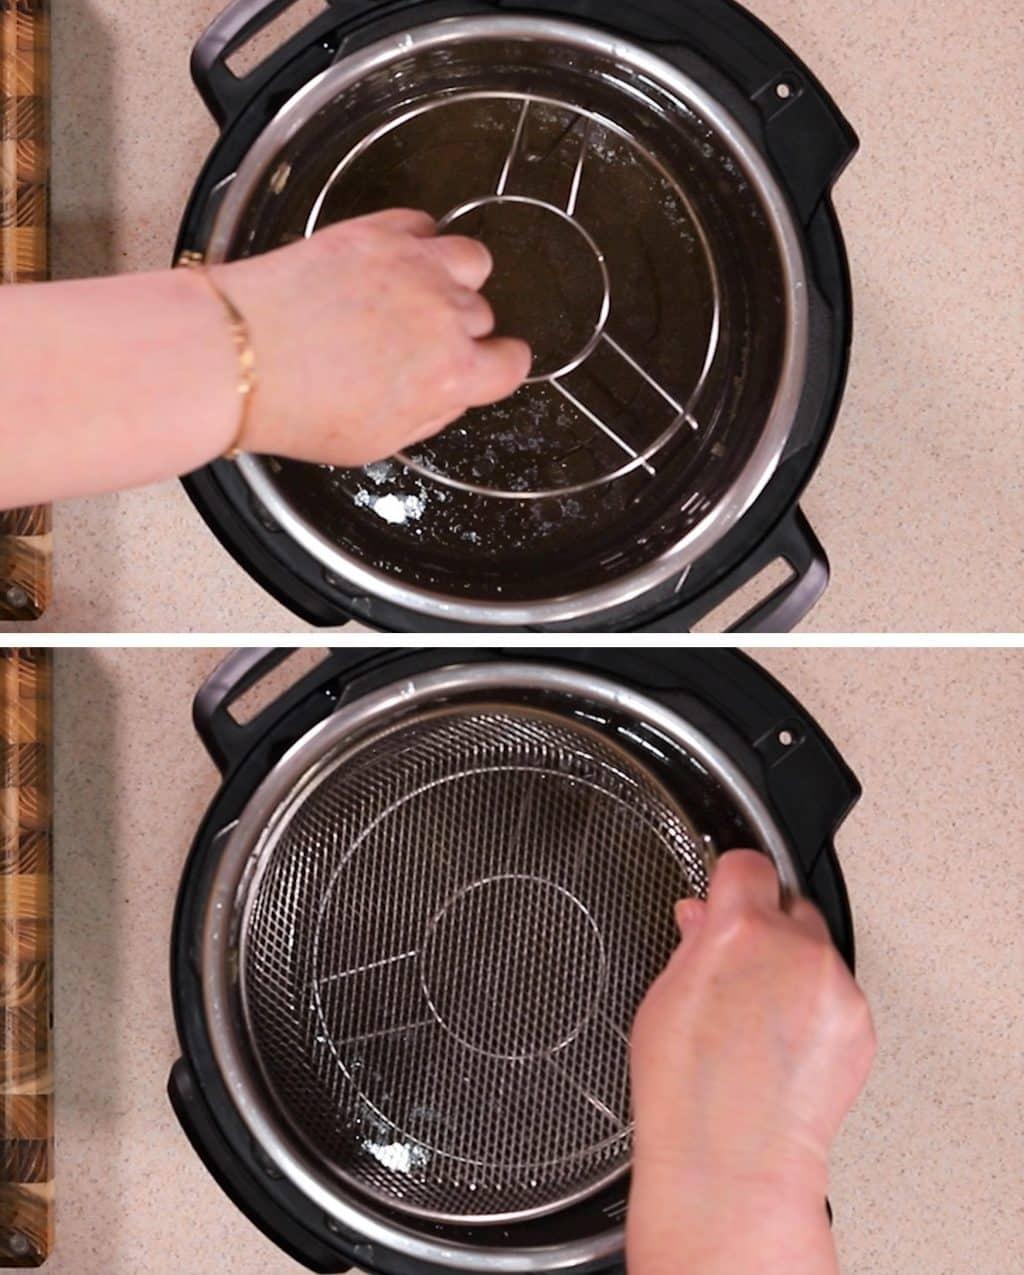 Place Trivet and CrispLid Basket into Instant Pot